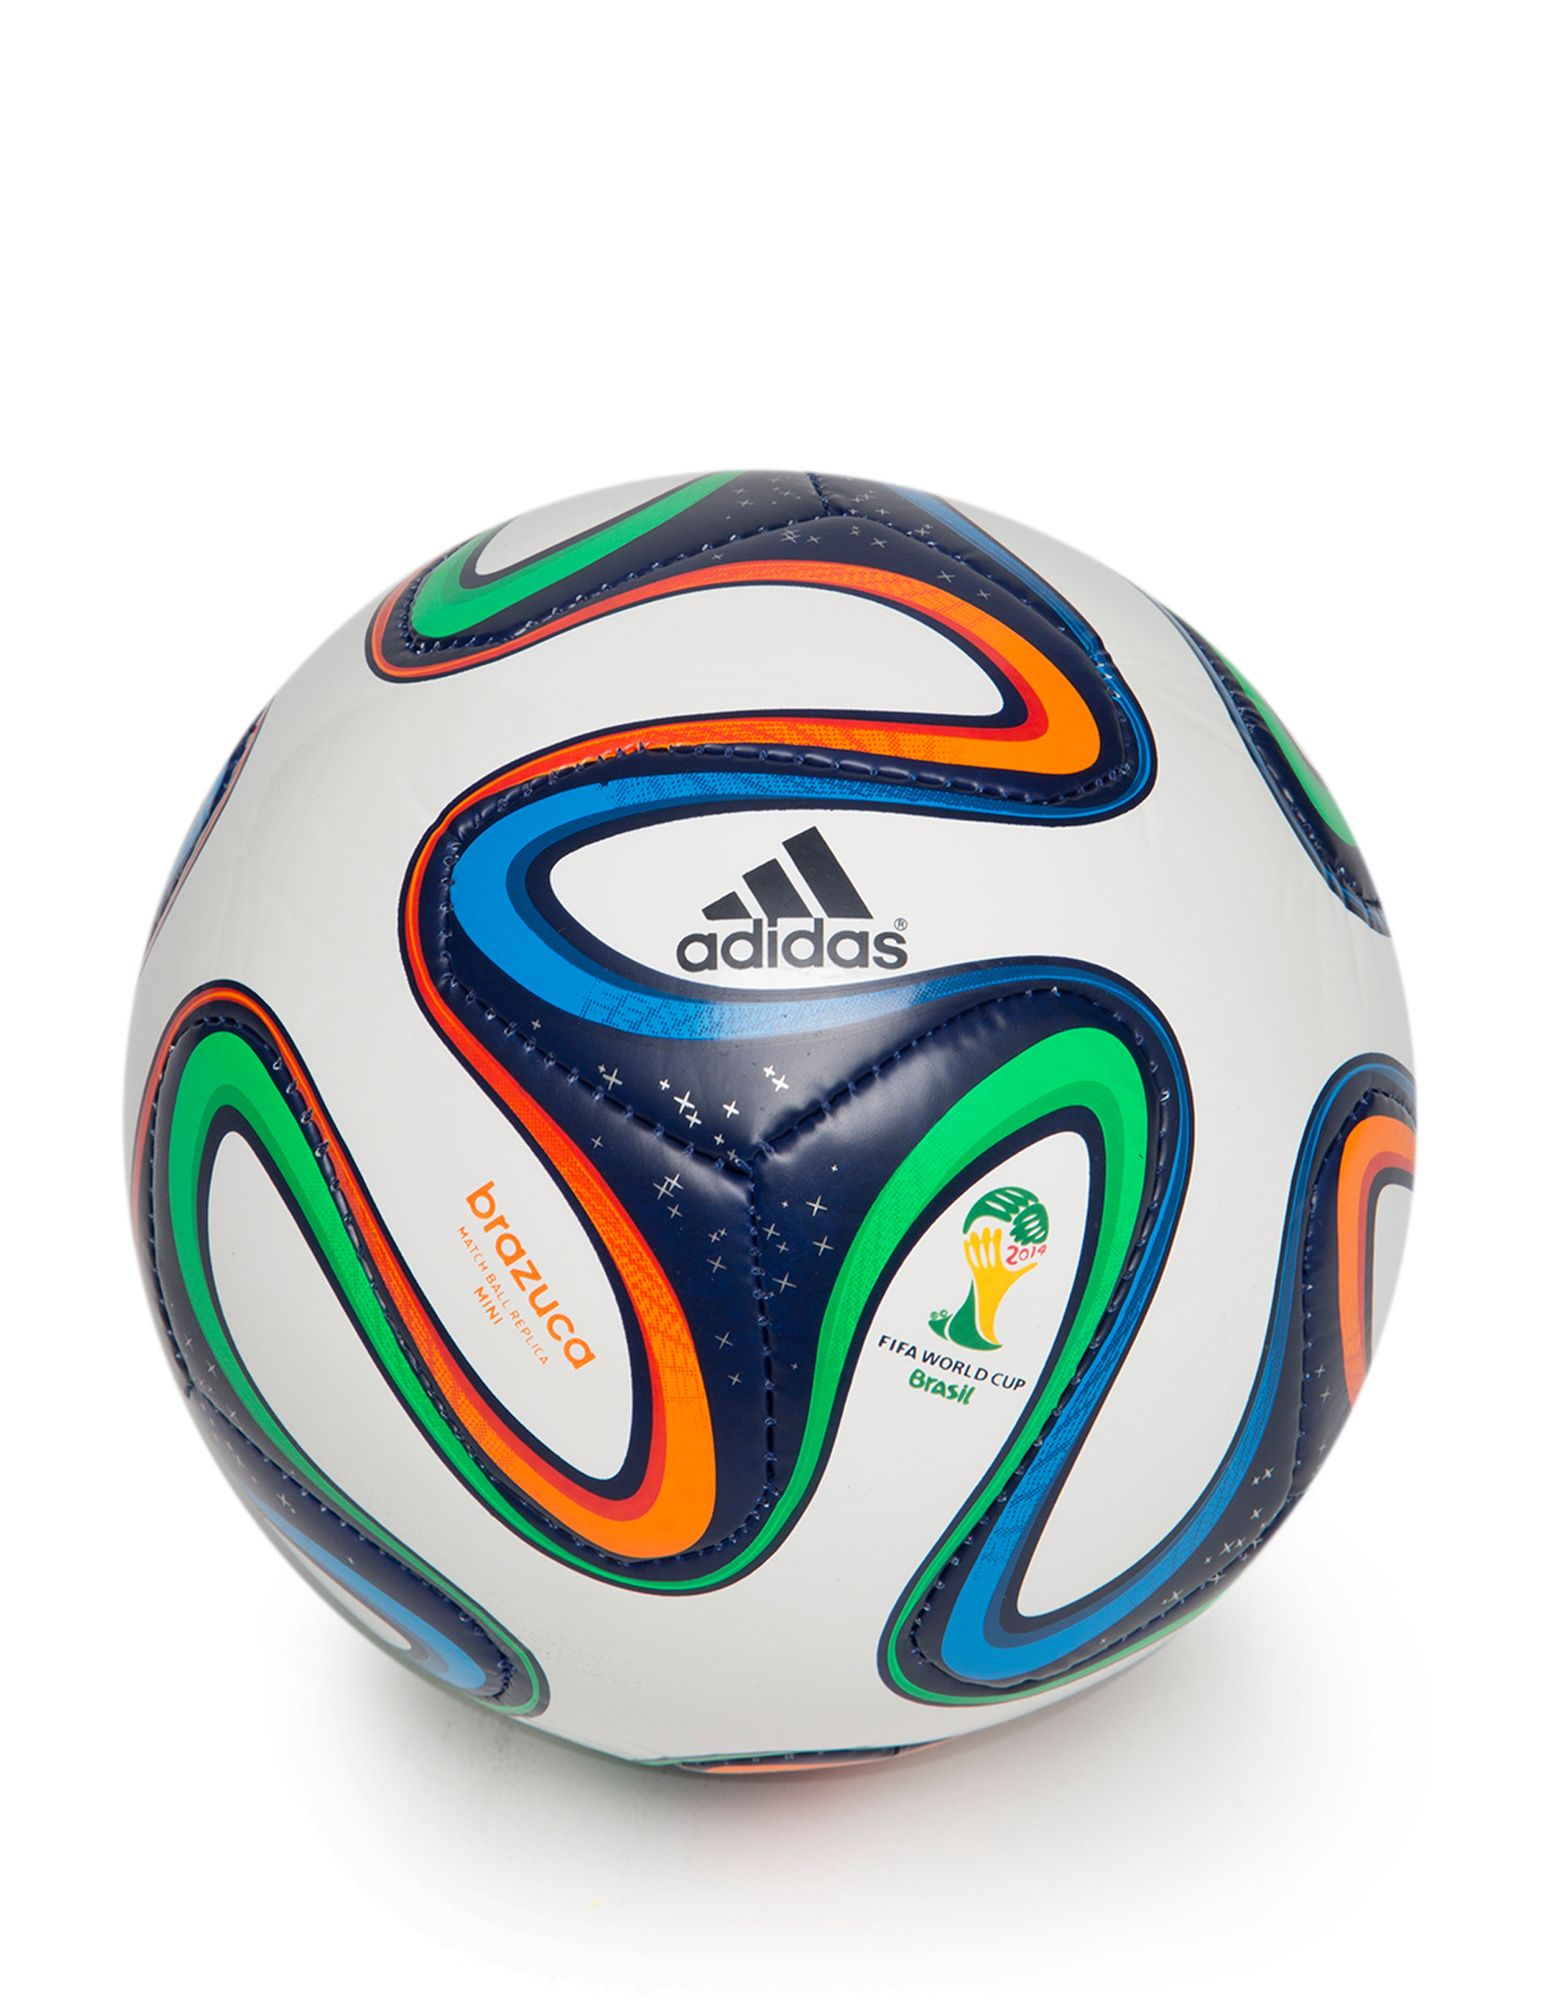 adidas Brazuca FIFA 2014 World Cup Mini Football